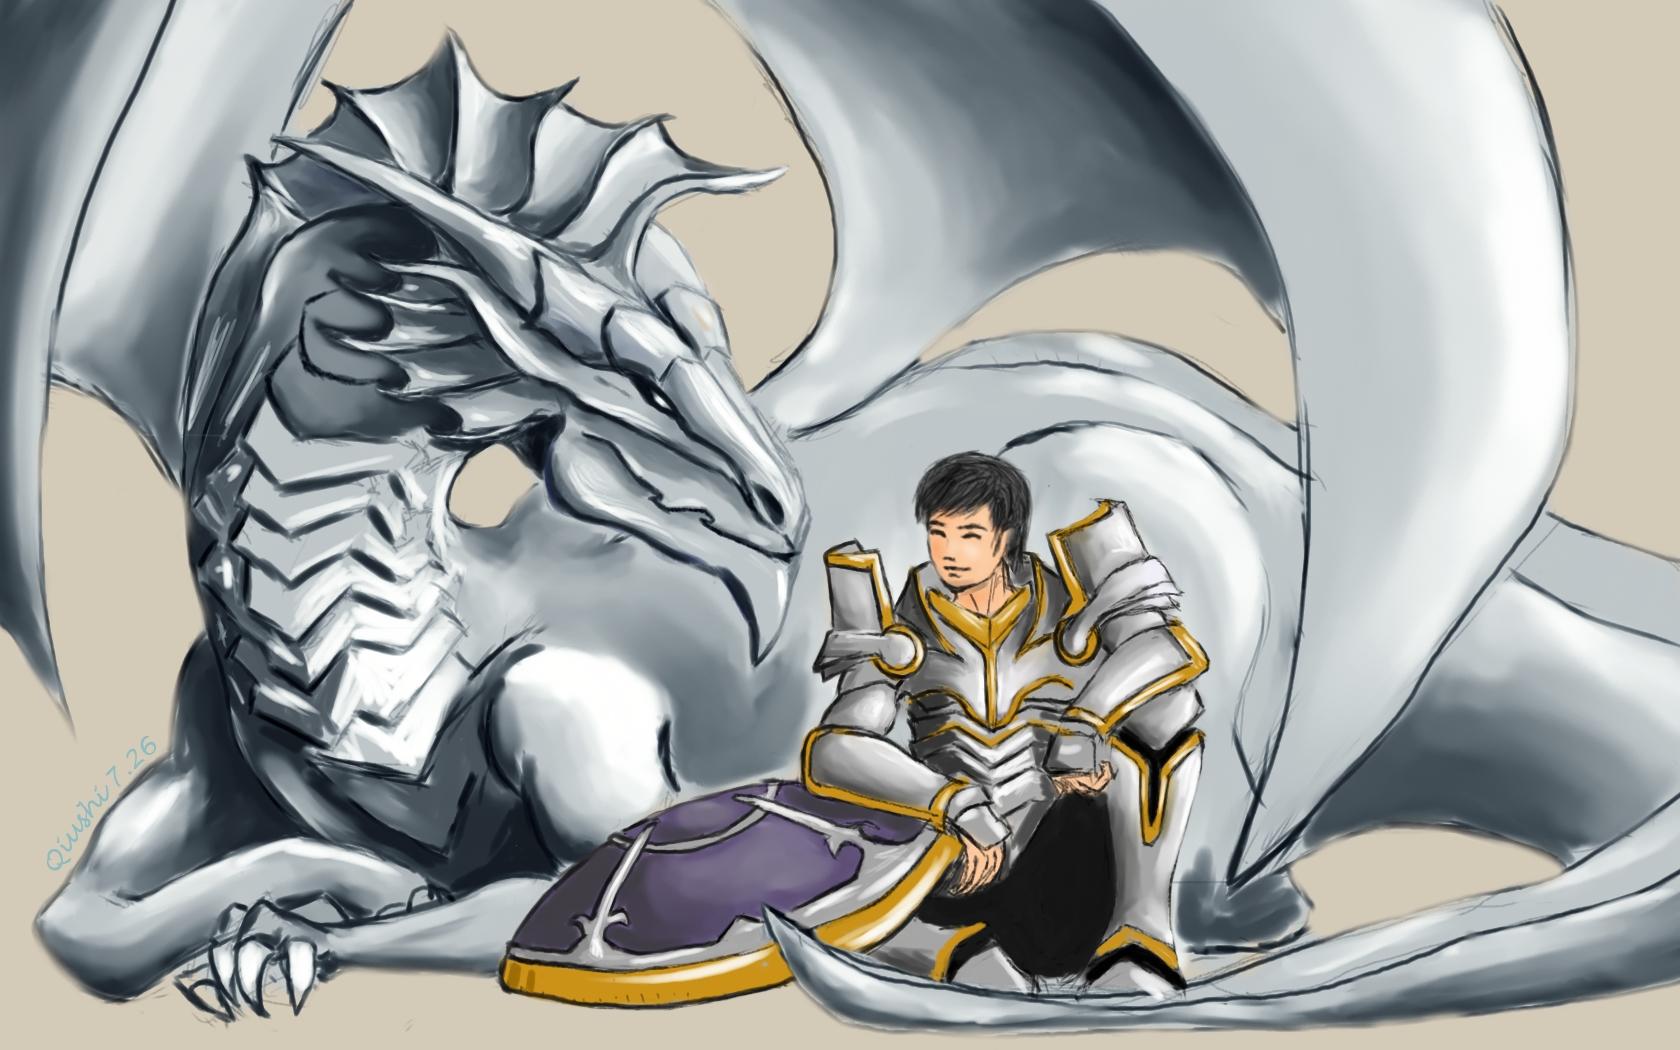 dragon and knight of shield by qiushifu on DeviantArt